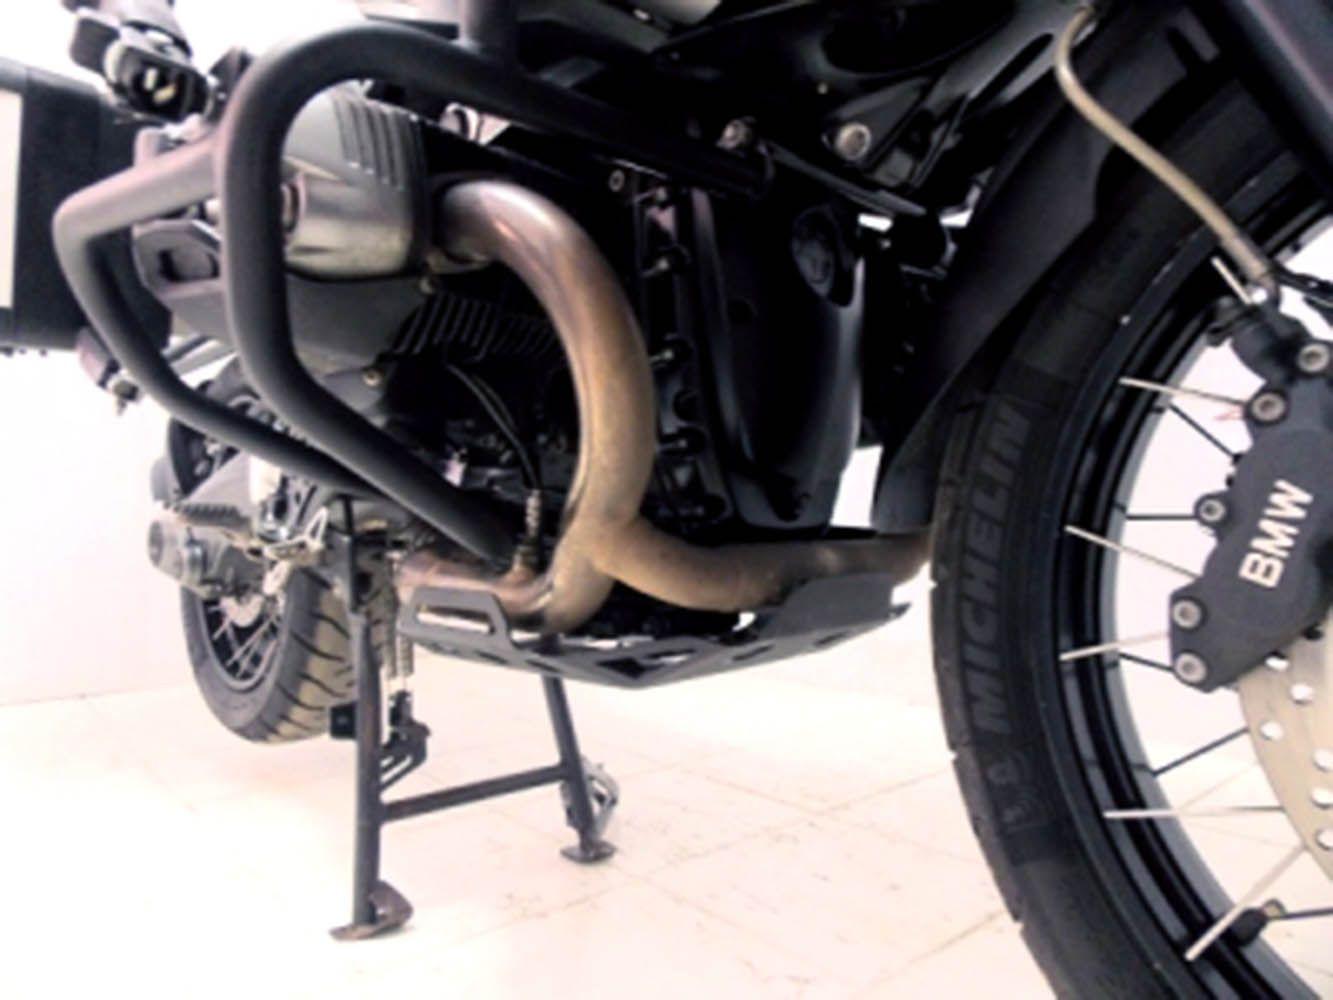 Protetor Carter R 1200 Gs Bmw Chapa Aço Chapam 08/12 9930